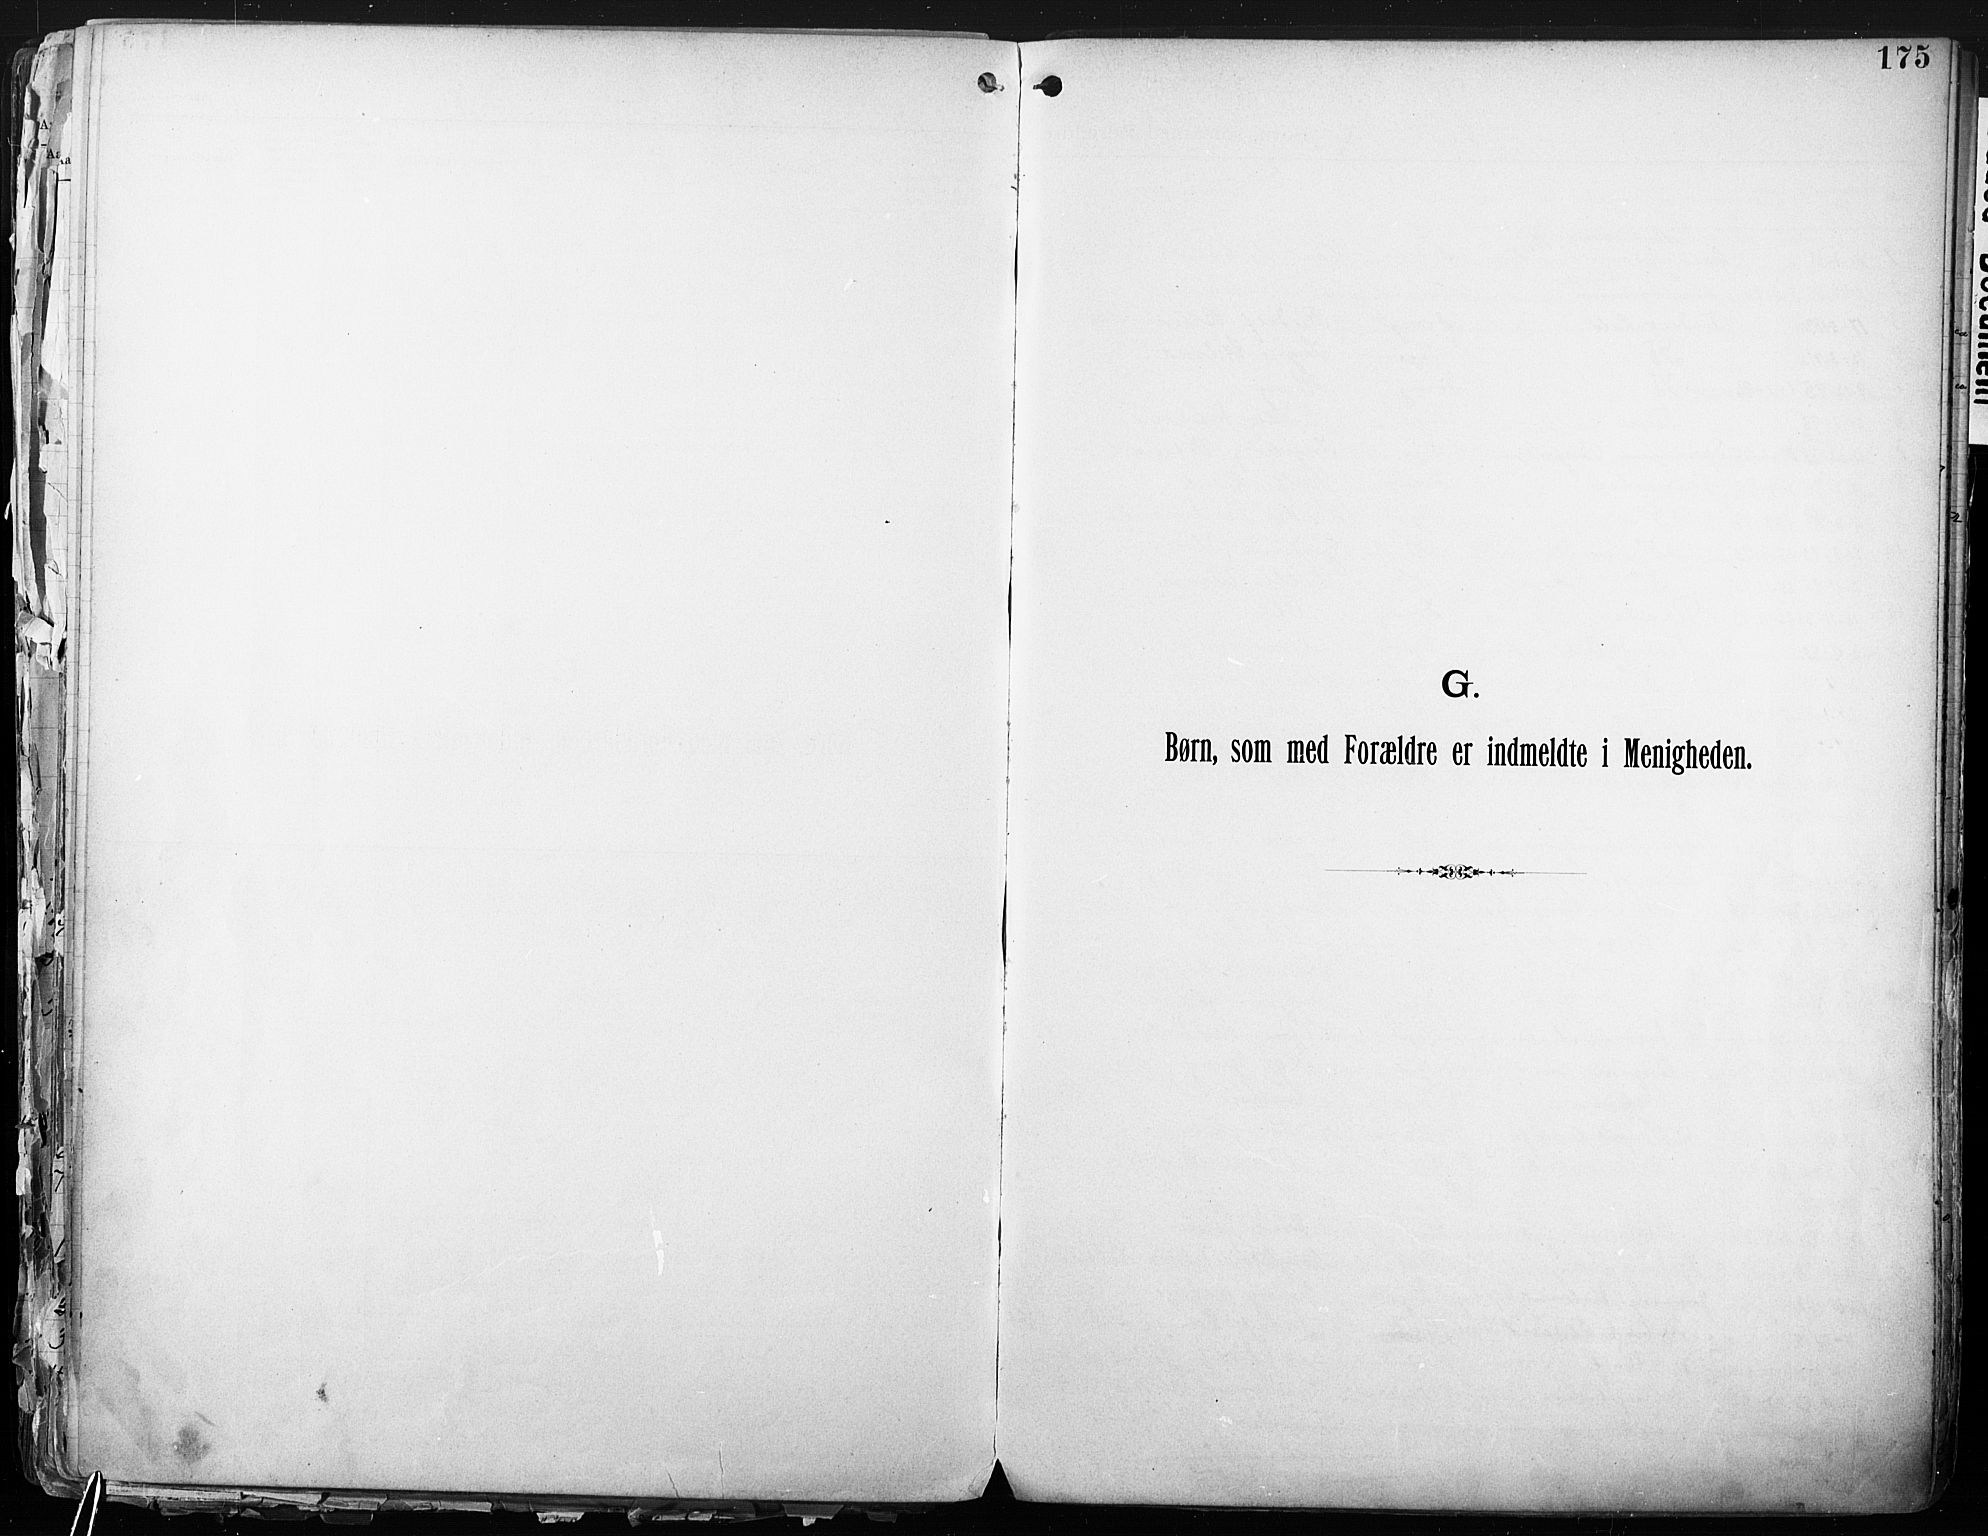 SAO, Sarpsborg metodistkirke, A/L0004: Dissenter register no. 4, 1892-1923, p. 175